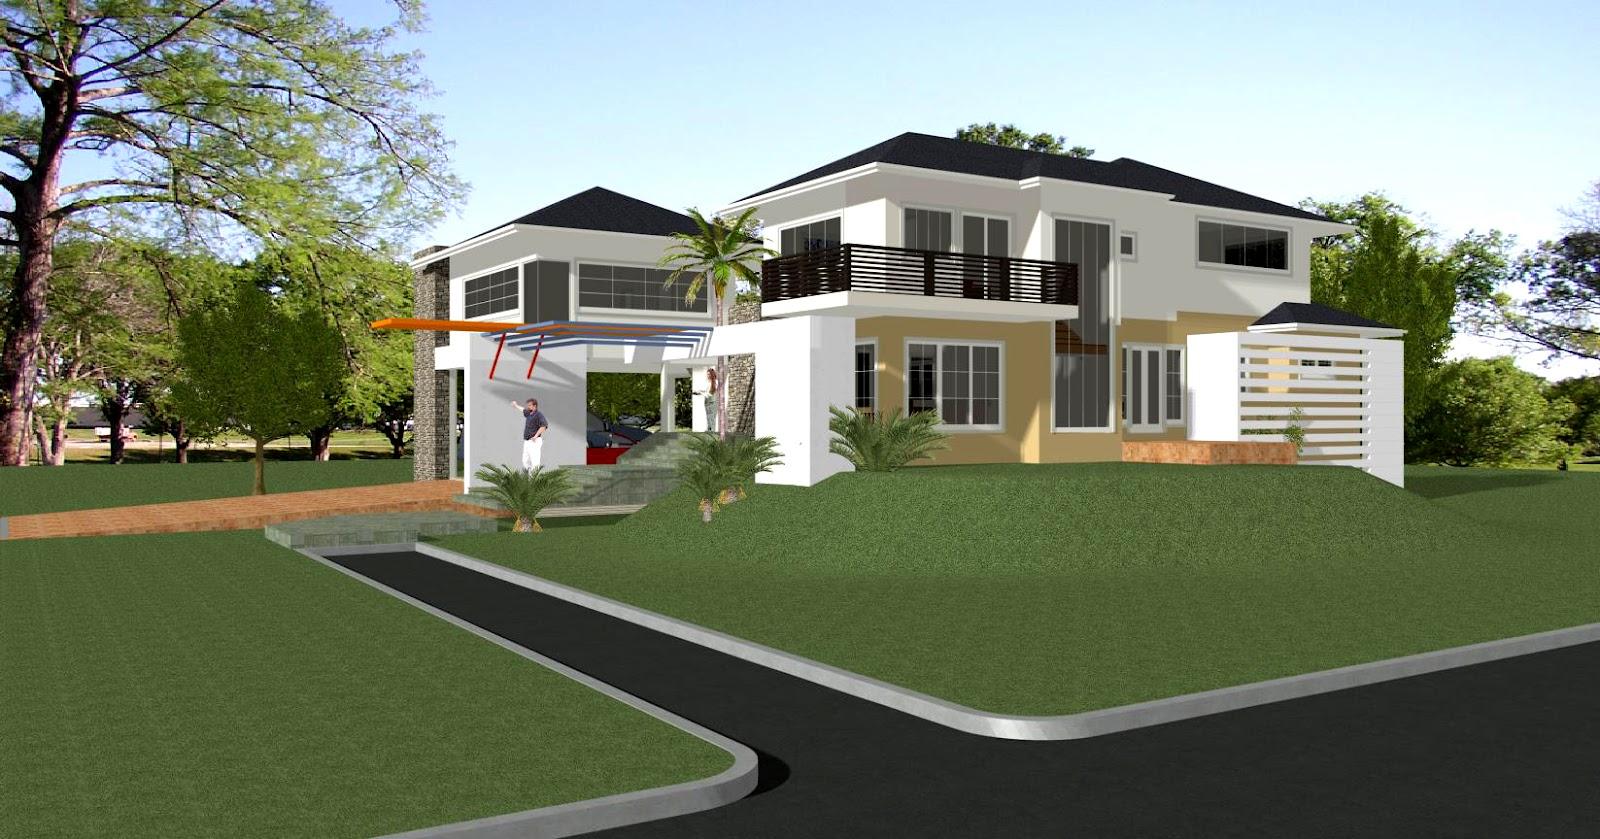 New House Construction Ideas